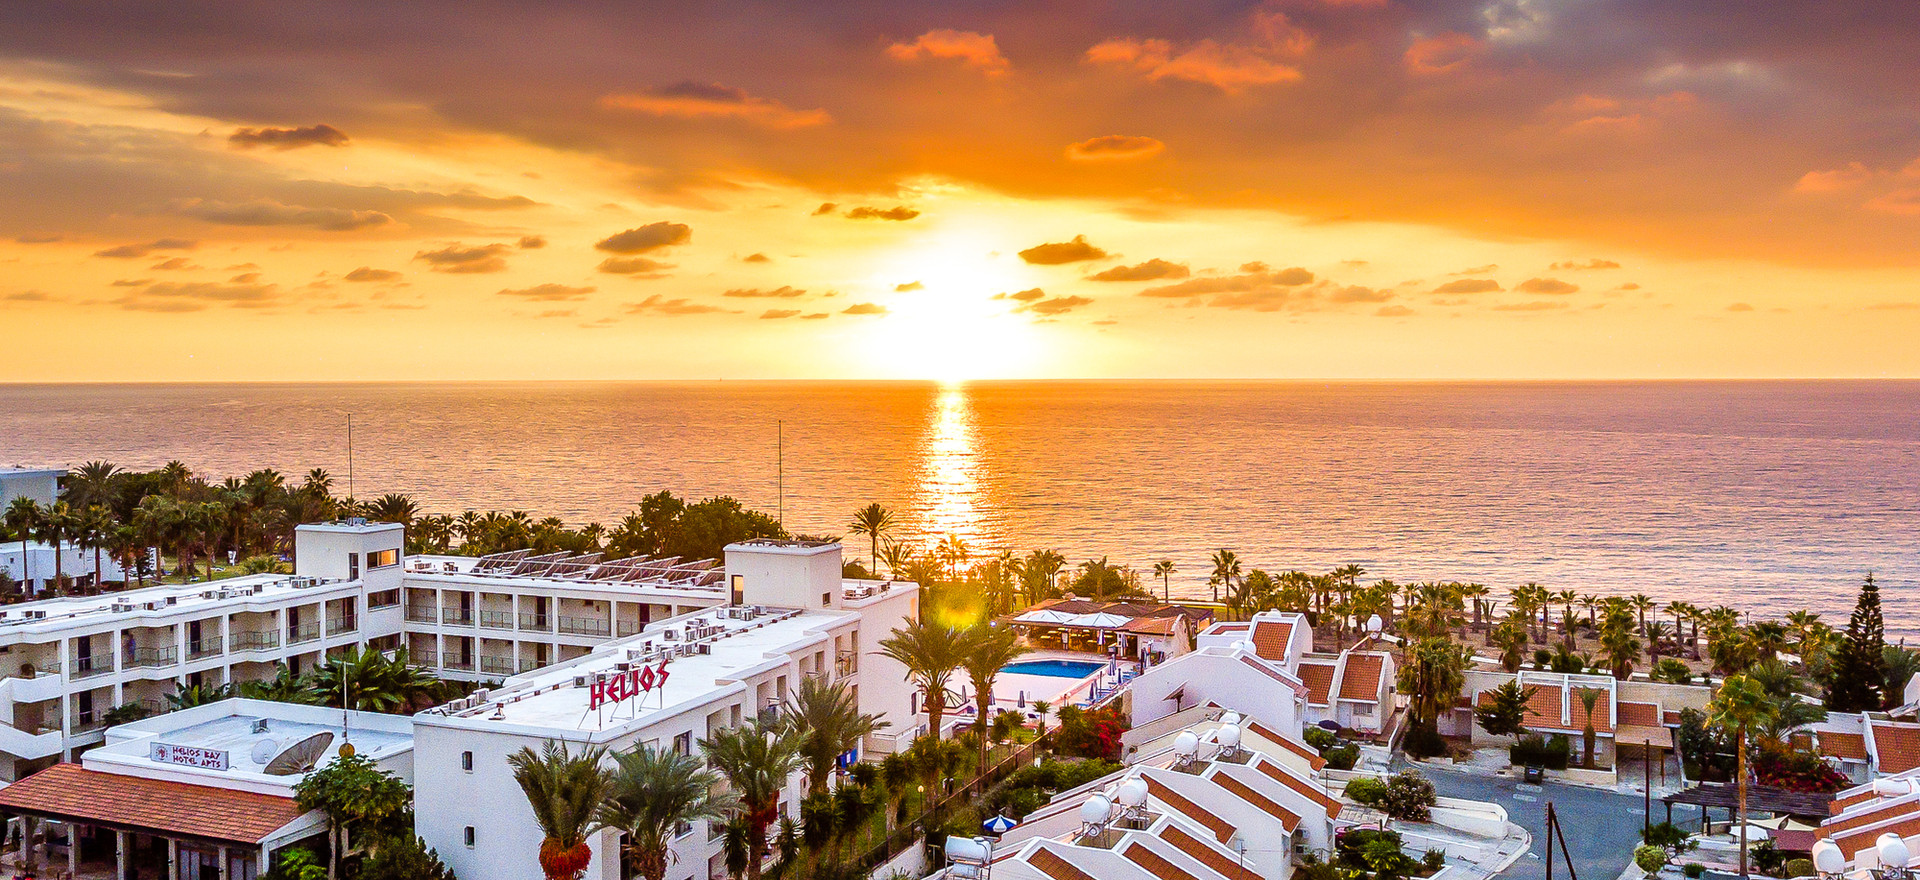 Helios bay hotel sunset